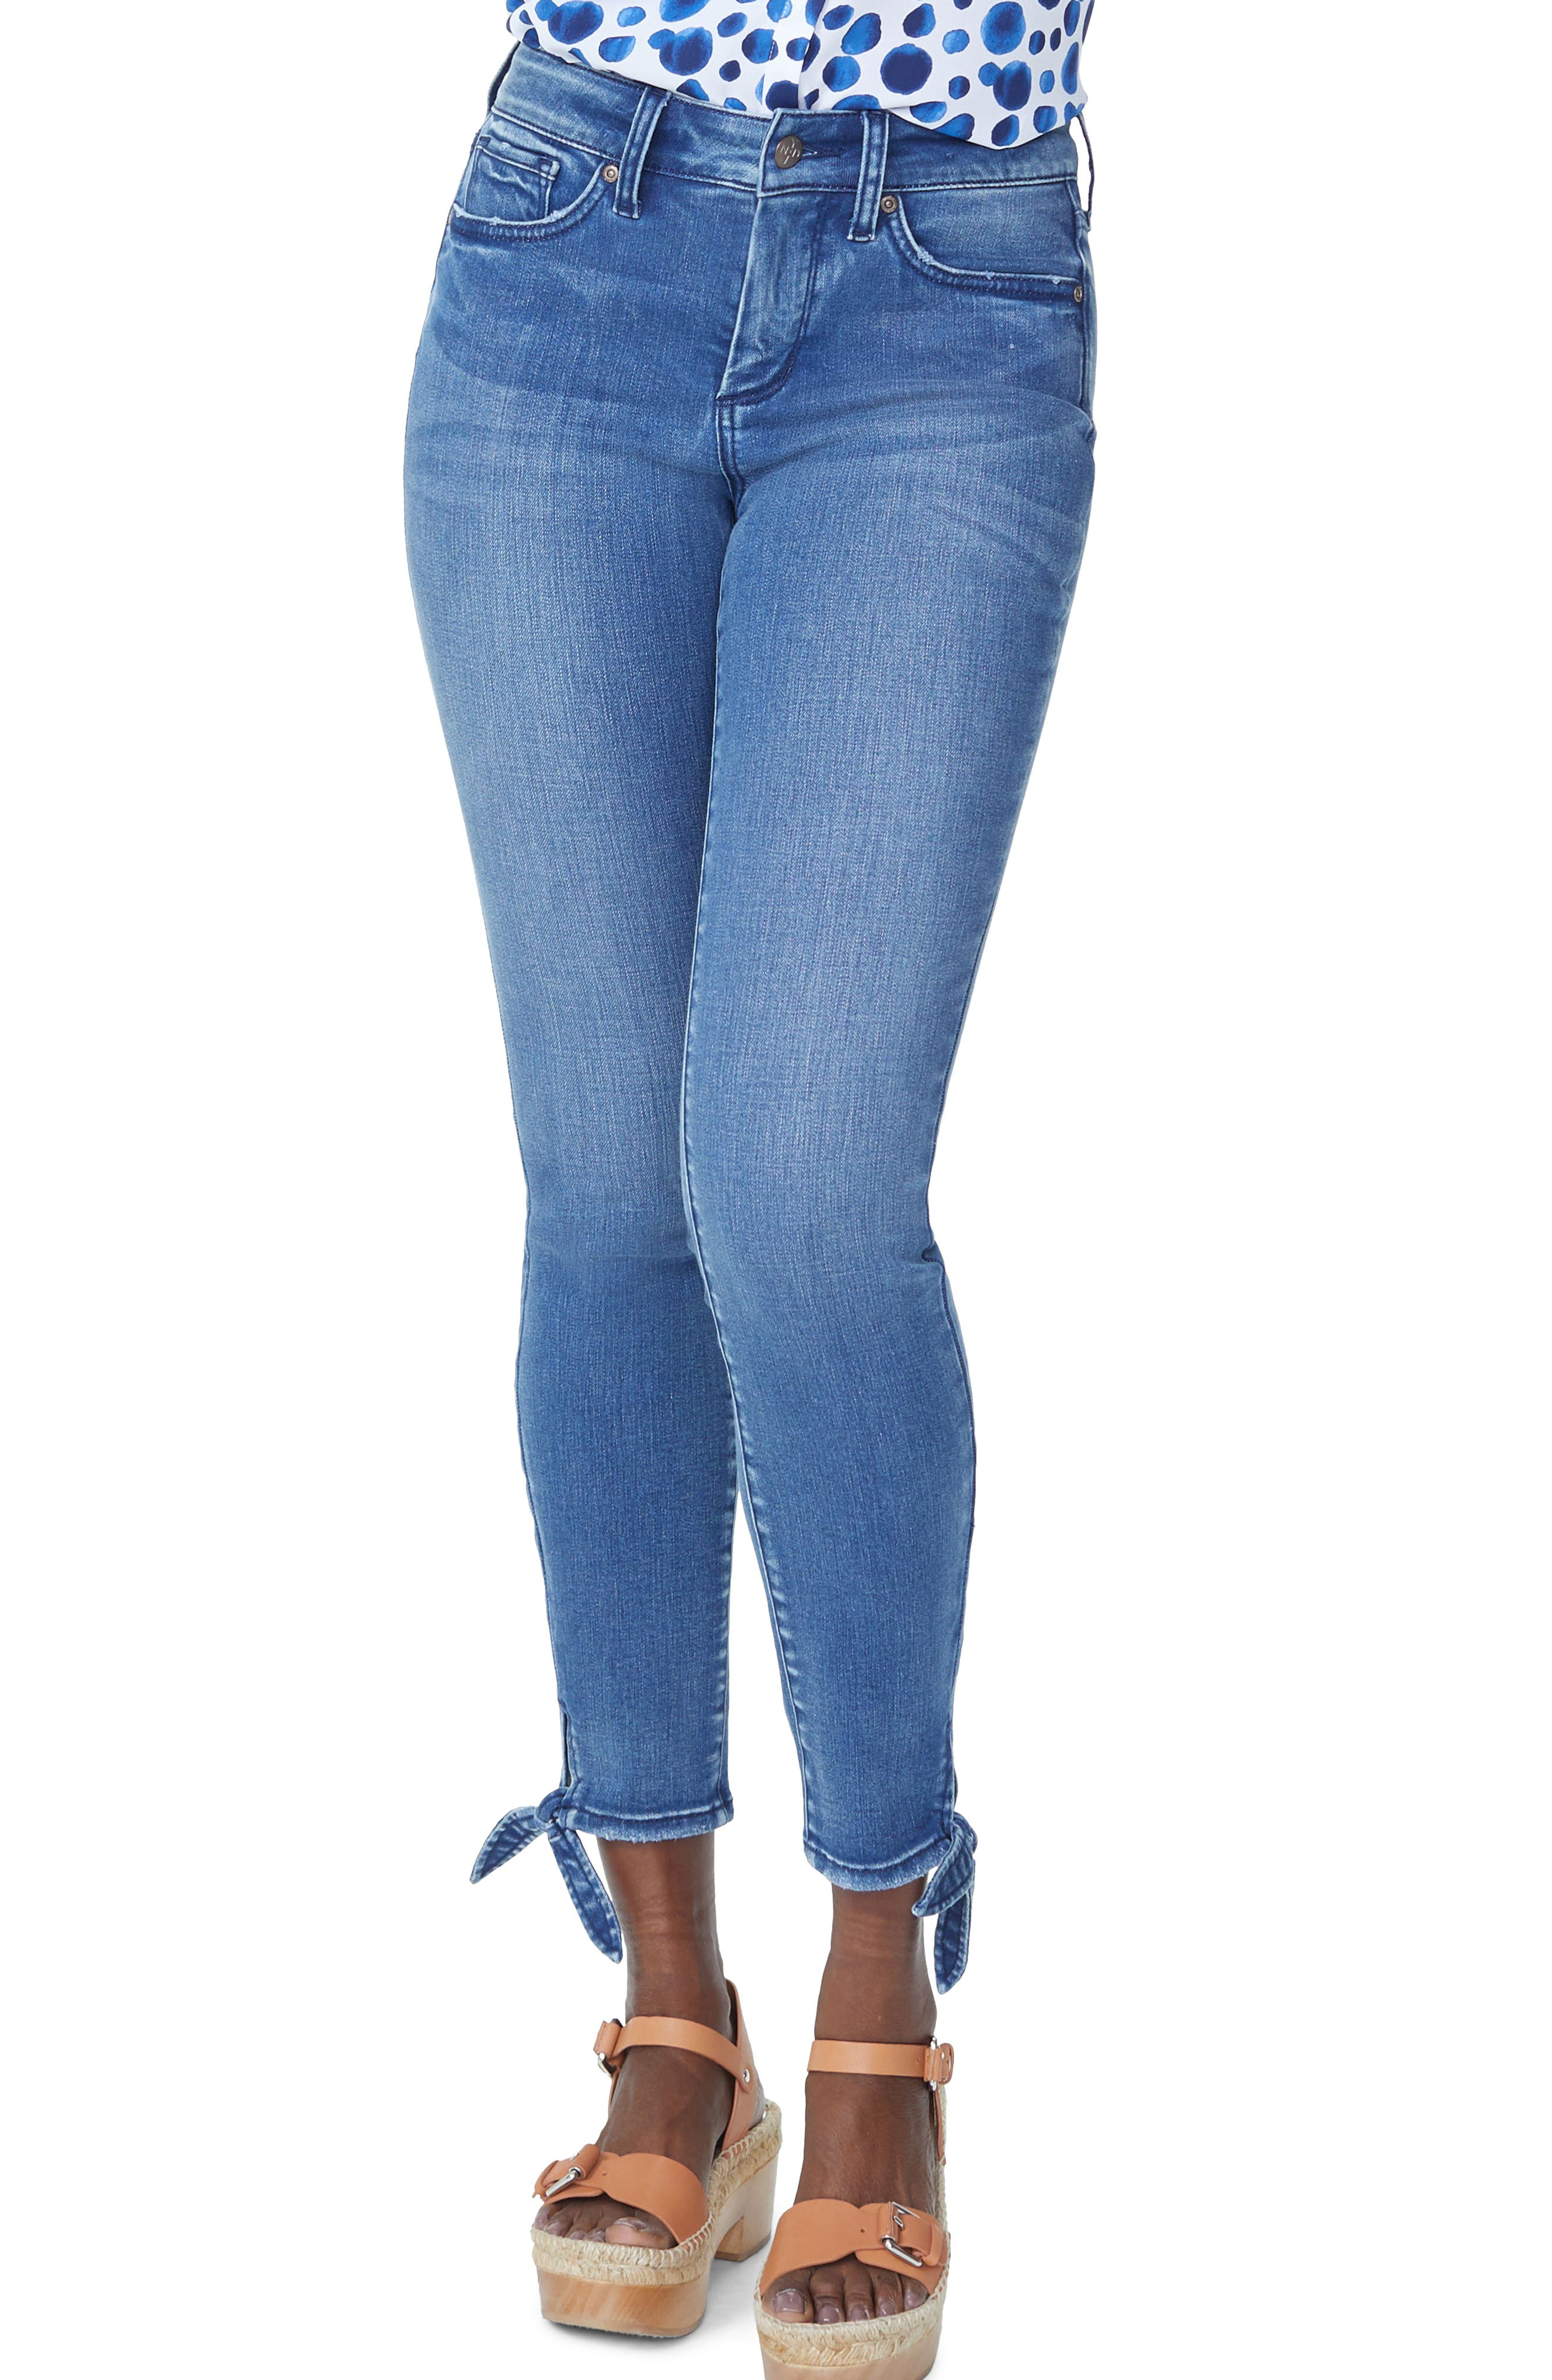 Image of NYDJ Ami High Waist Tie Hem Ankle Skinny Jeans